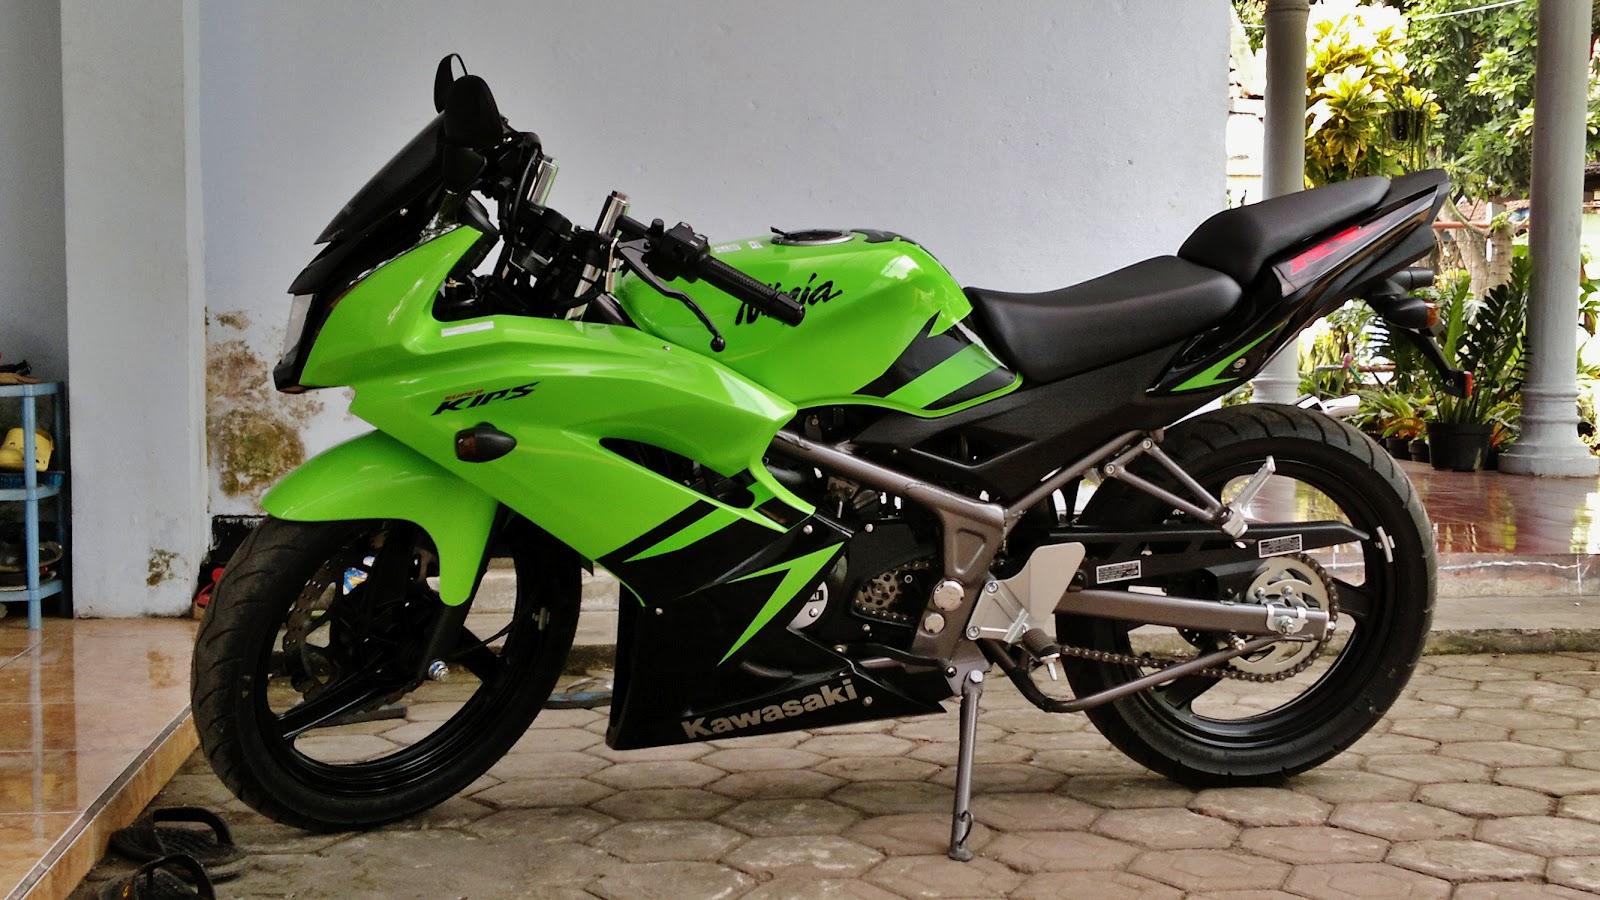 Modifikasi Kawasaki New Ninja 150 Rr